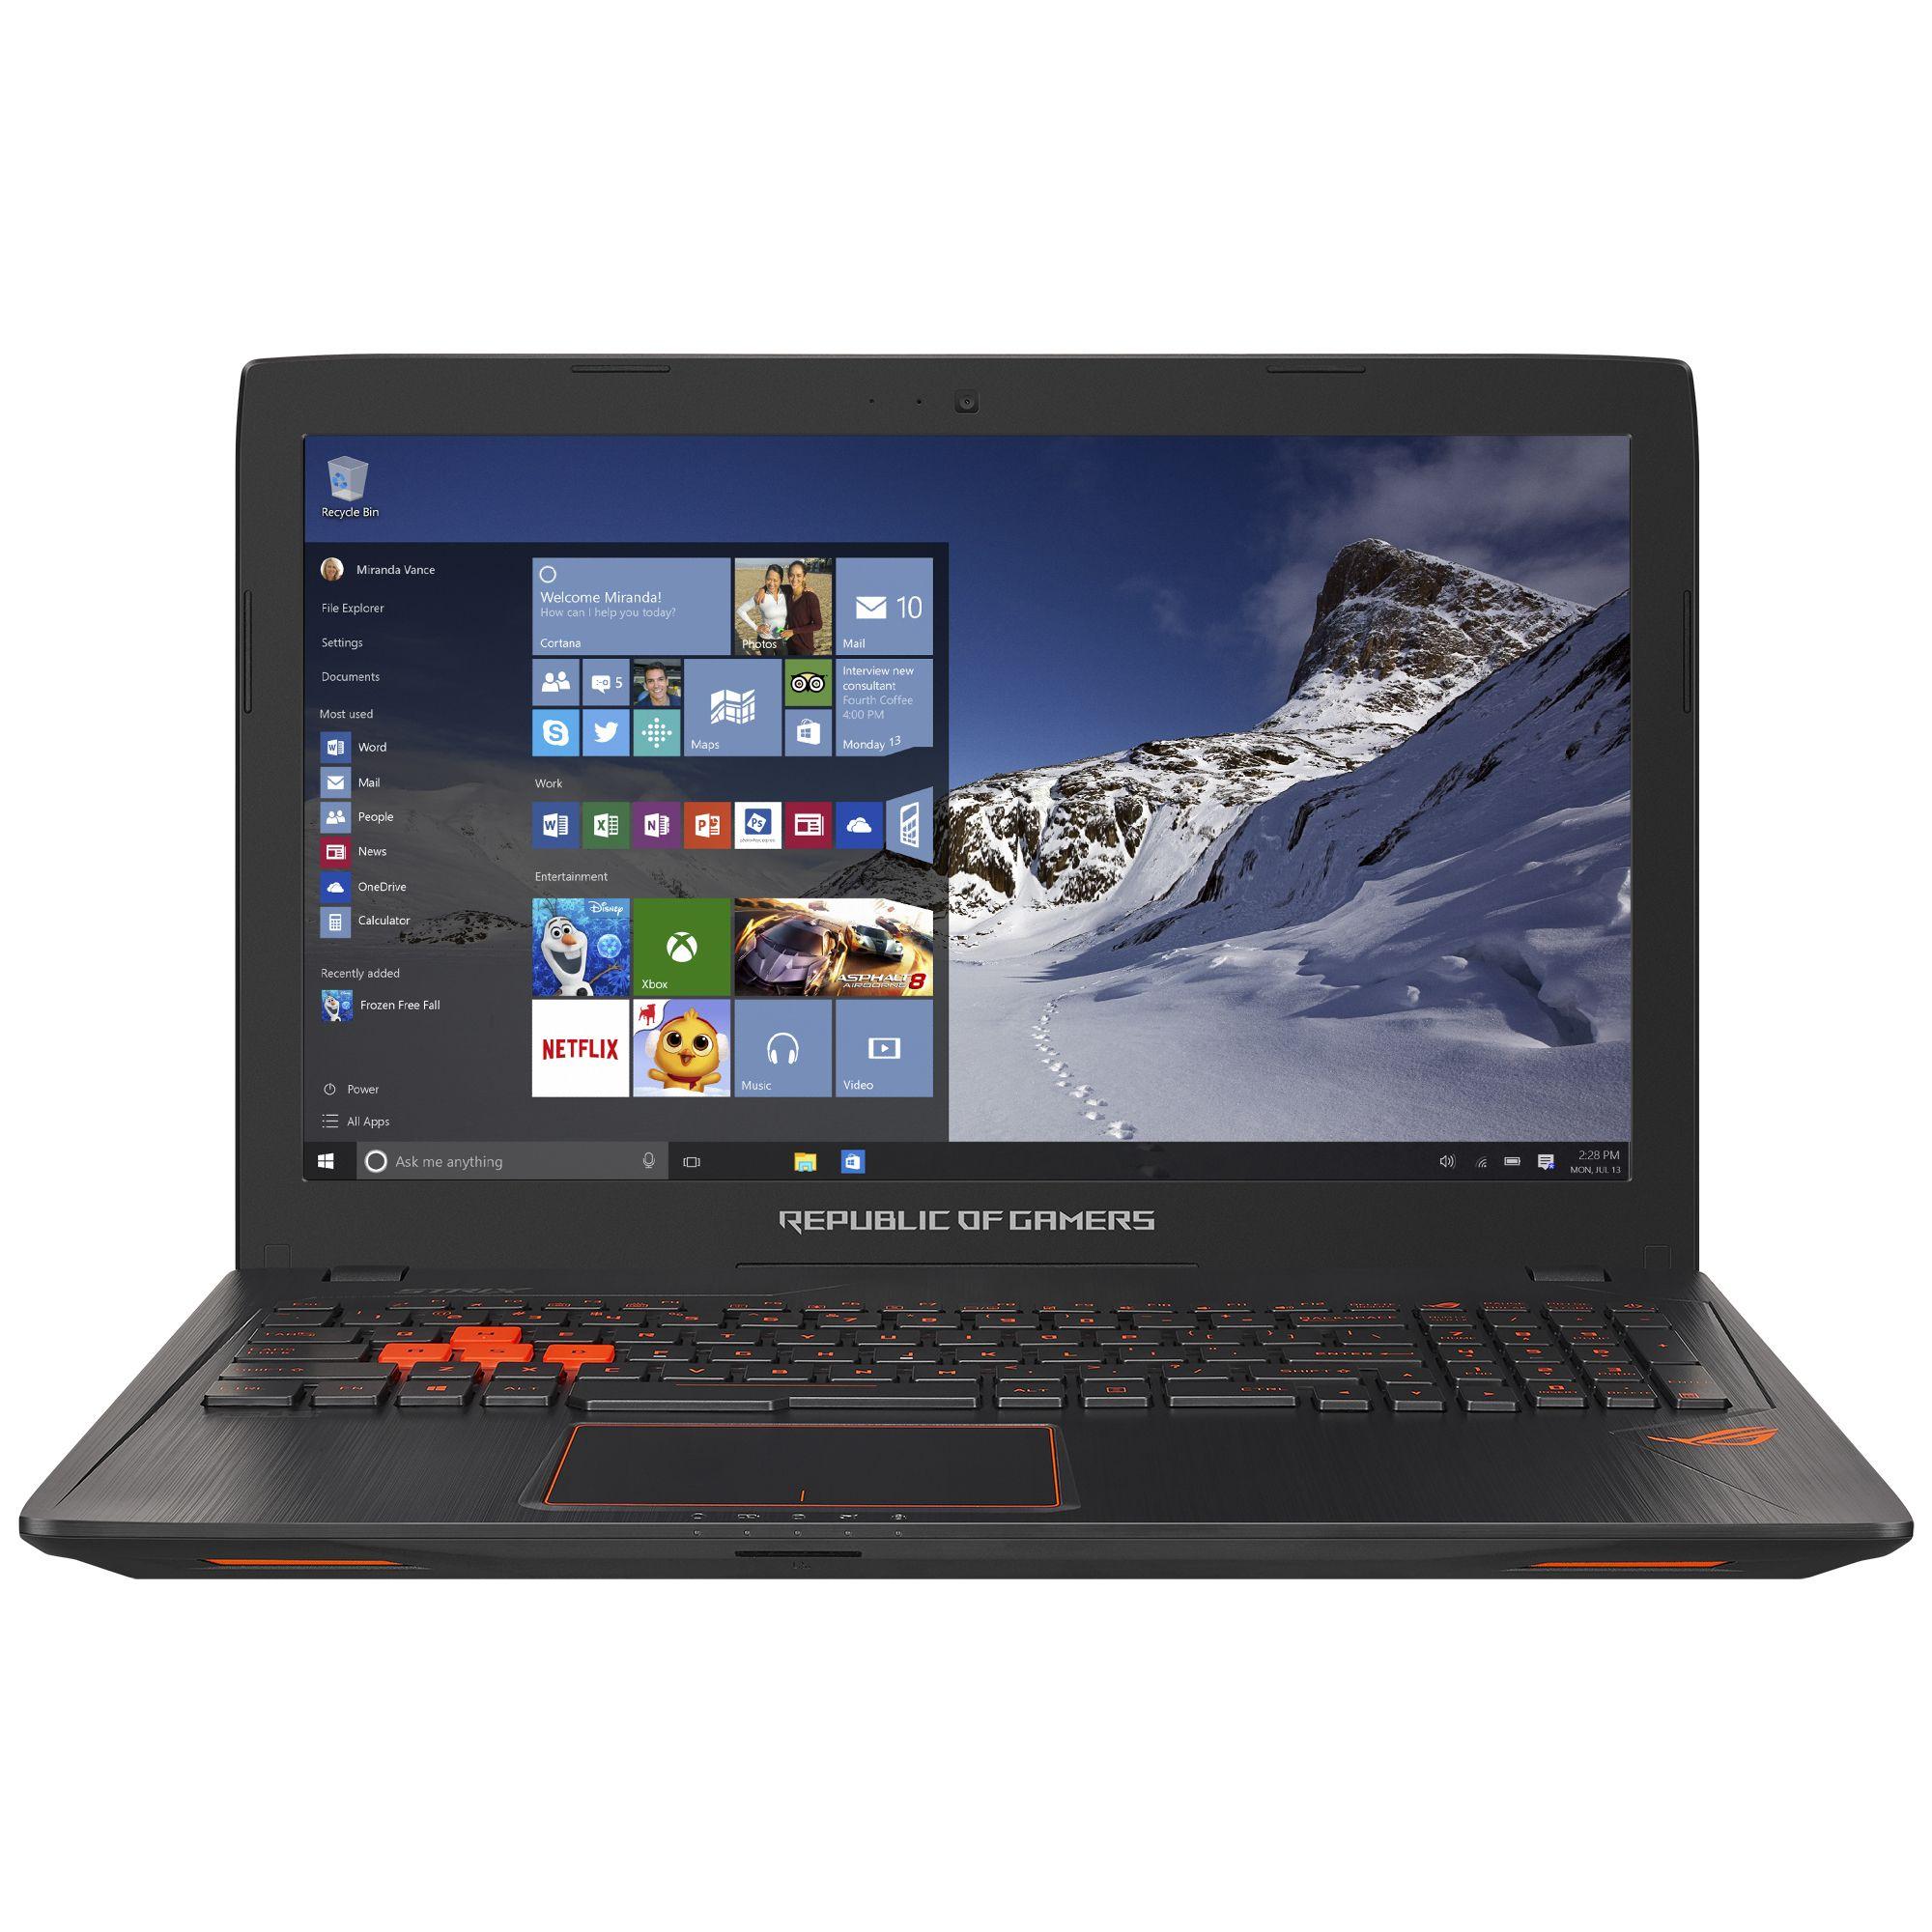 Notebook Asus ROG GL553VD 15.6 Full HD Intel Core i7-7700HQ GTX 1050-4GB RAM 16GB HDD 1TB FreeDOS